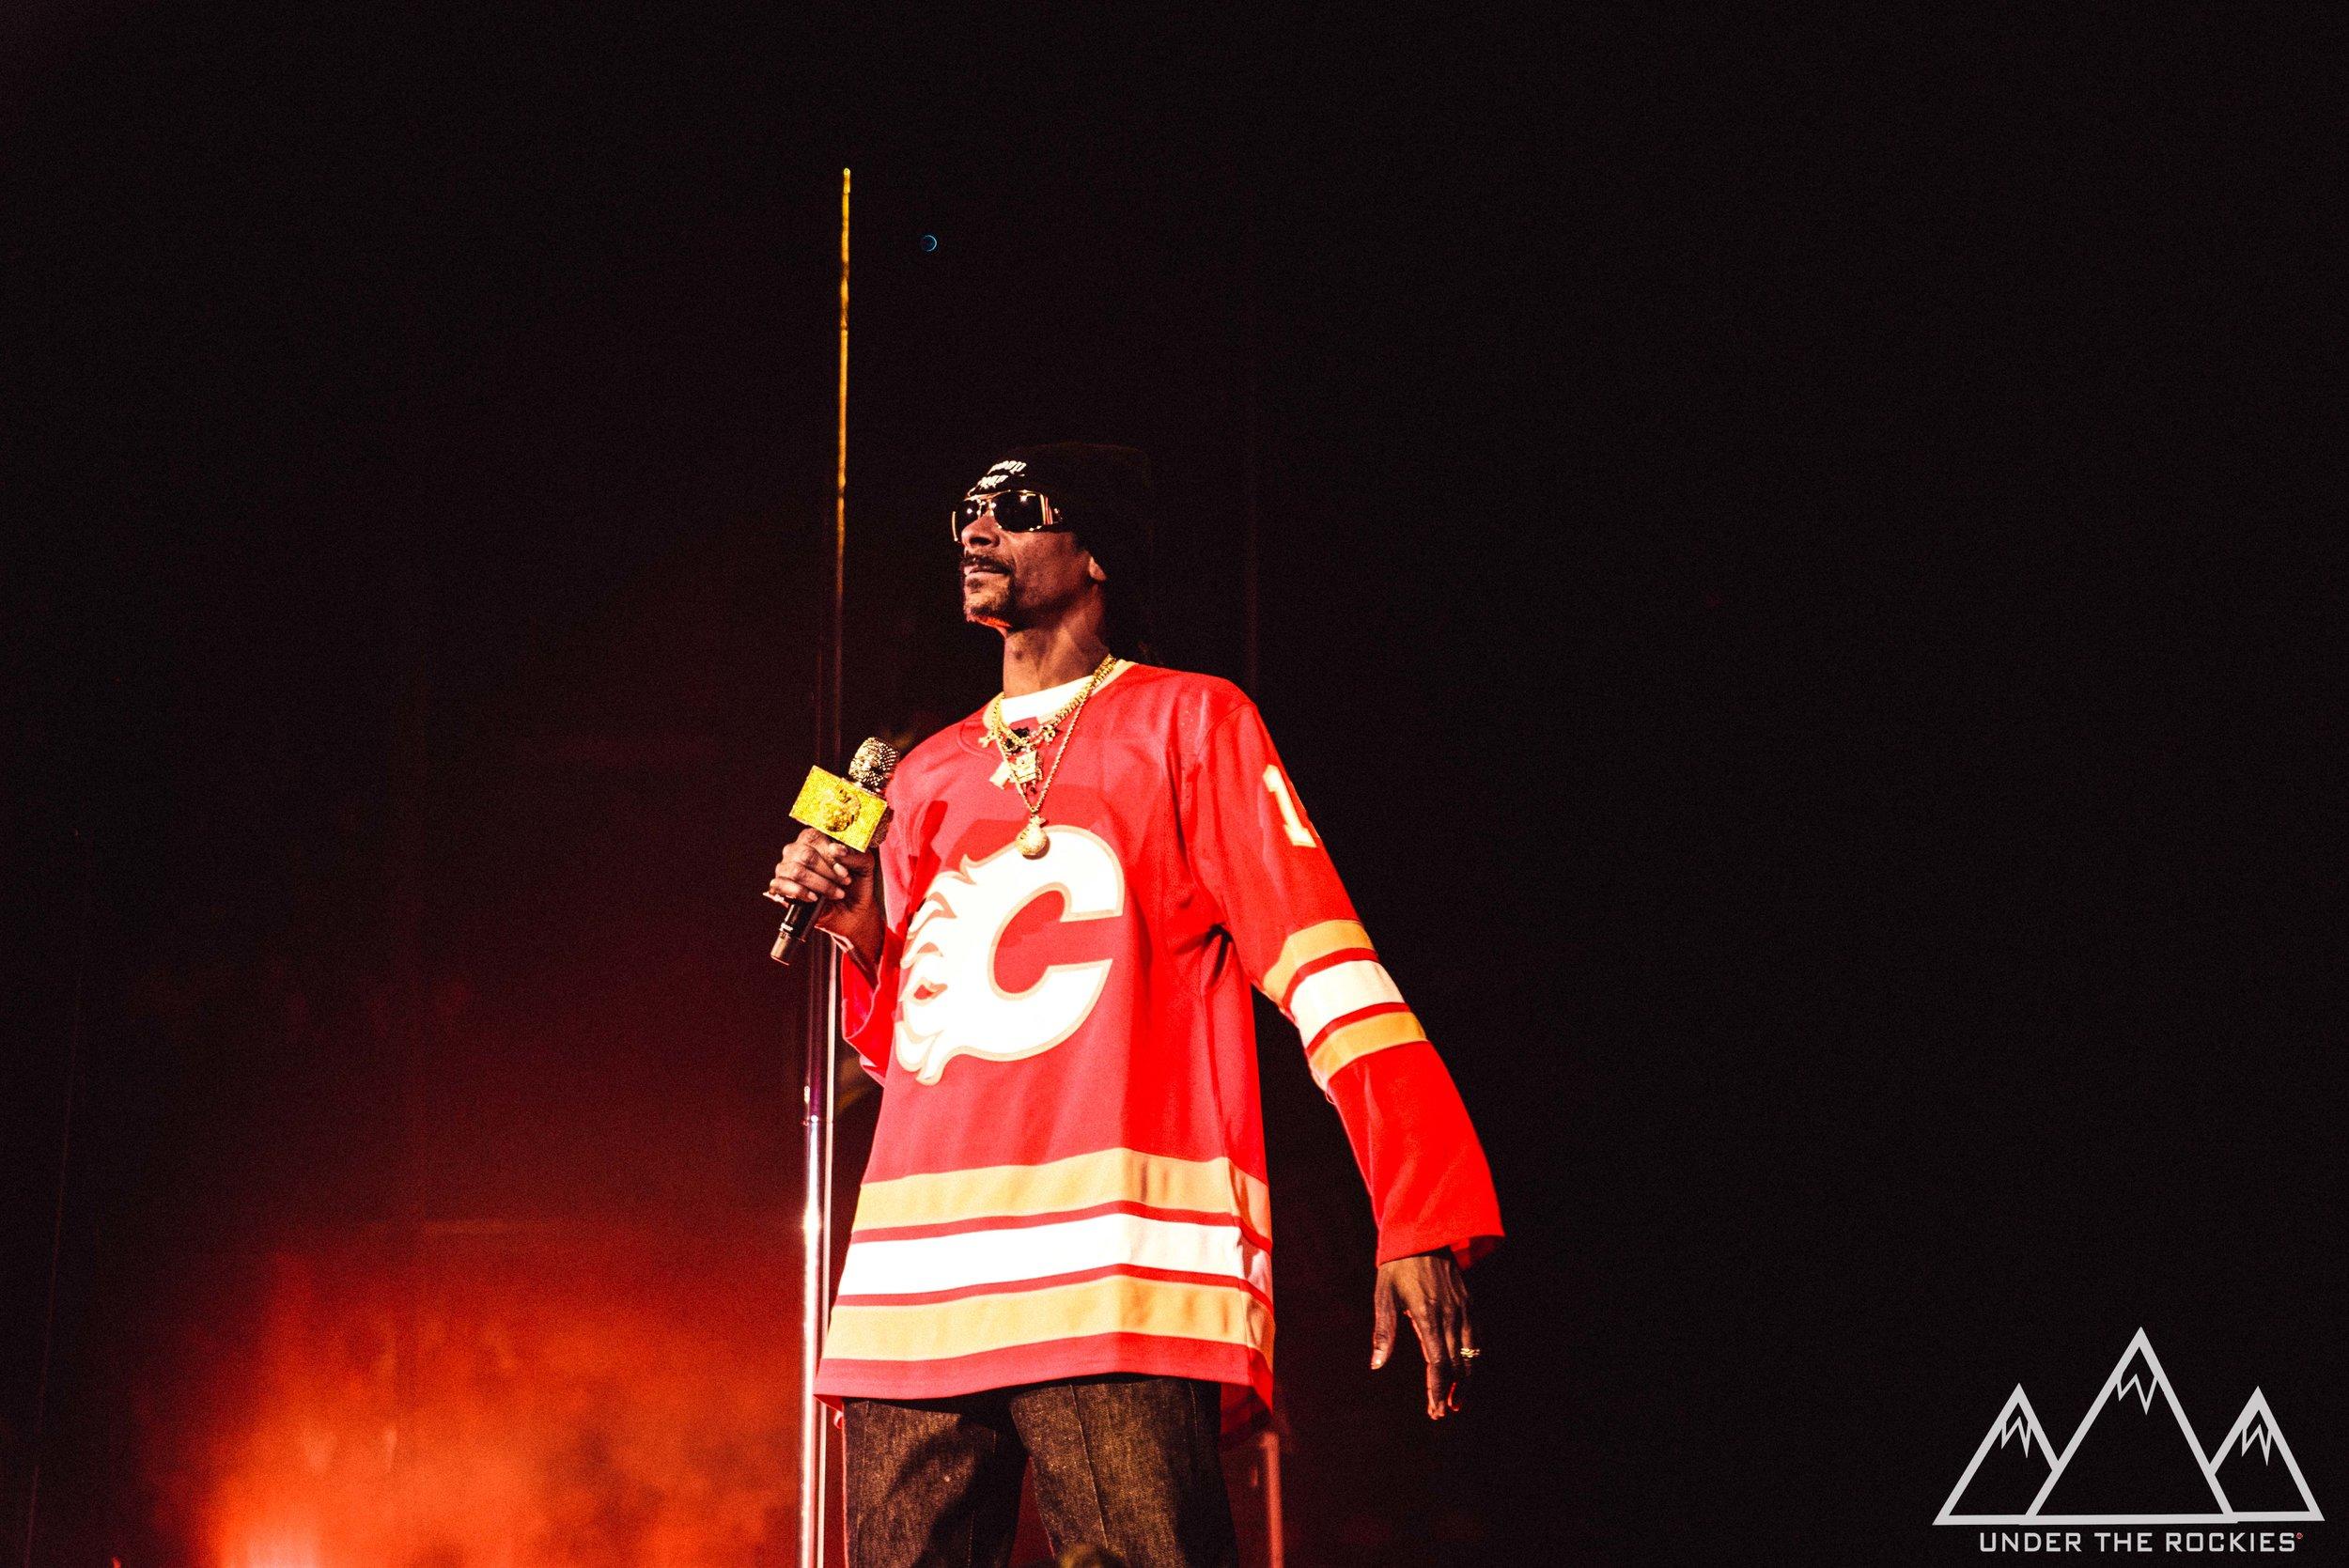 SnoopDogg-16-JJP-20190221.jpg